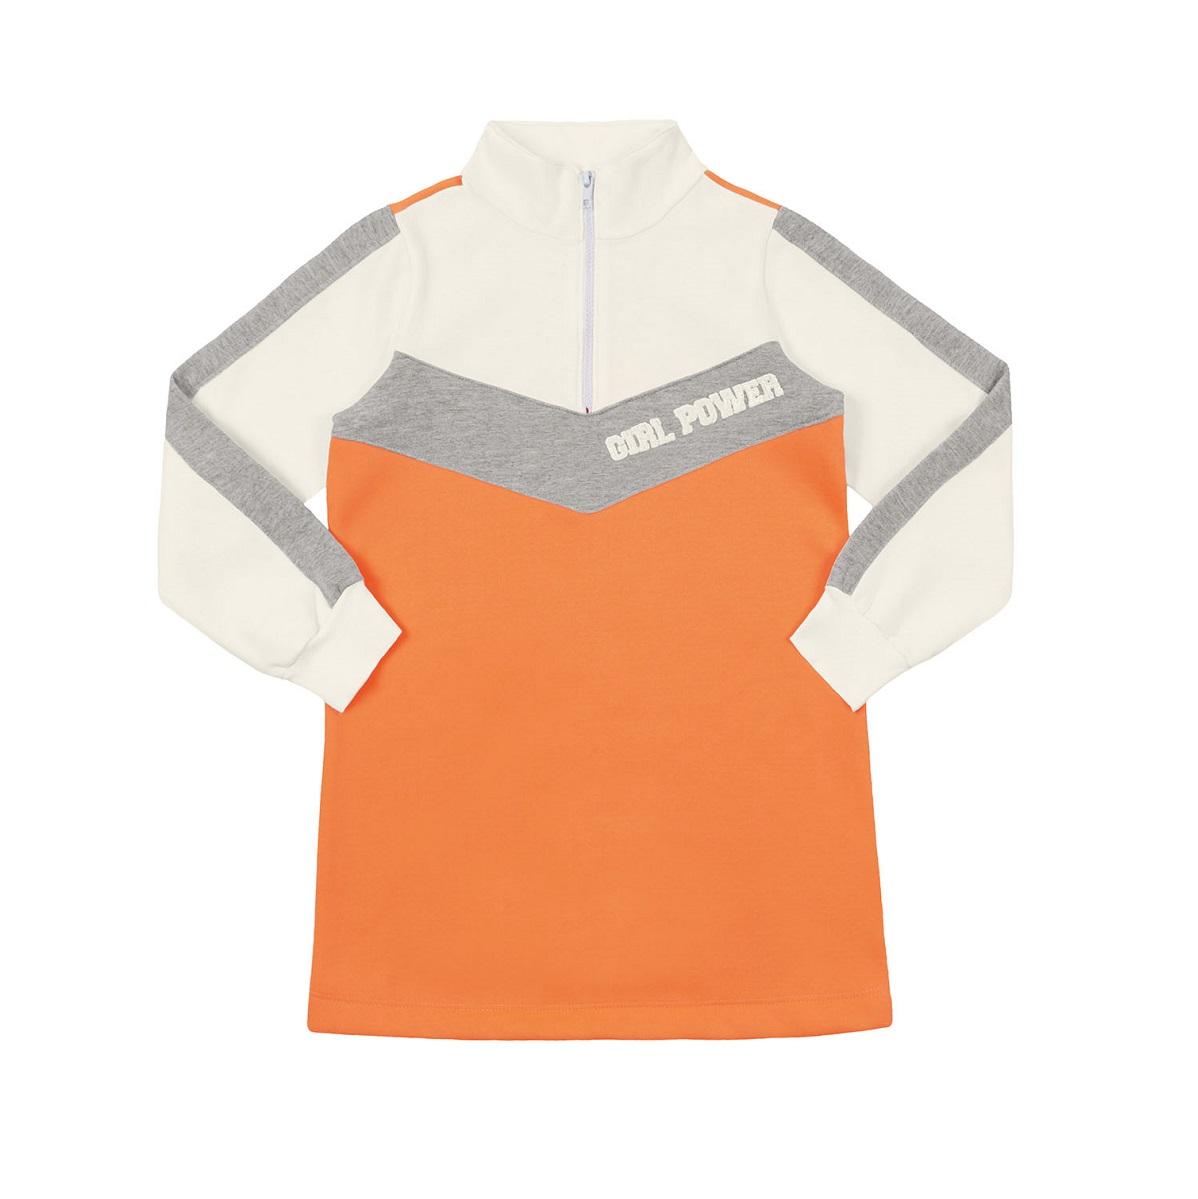 Vestido Infantil Newprene - MARLAN 29399